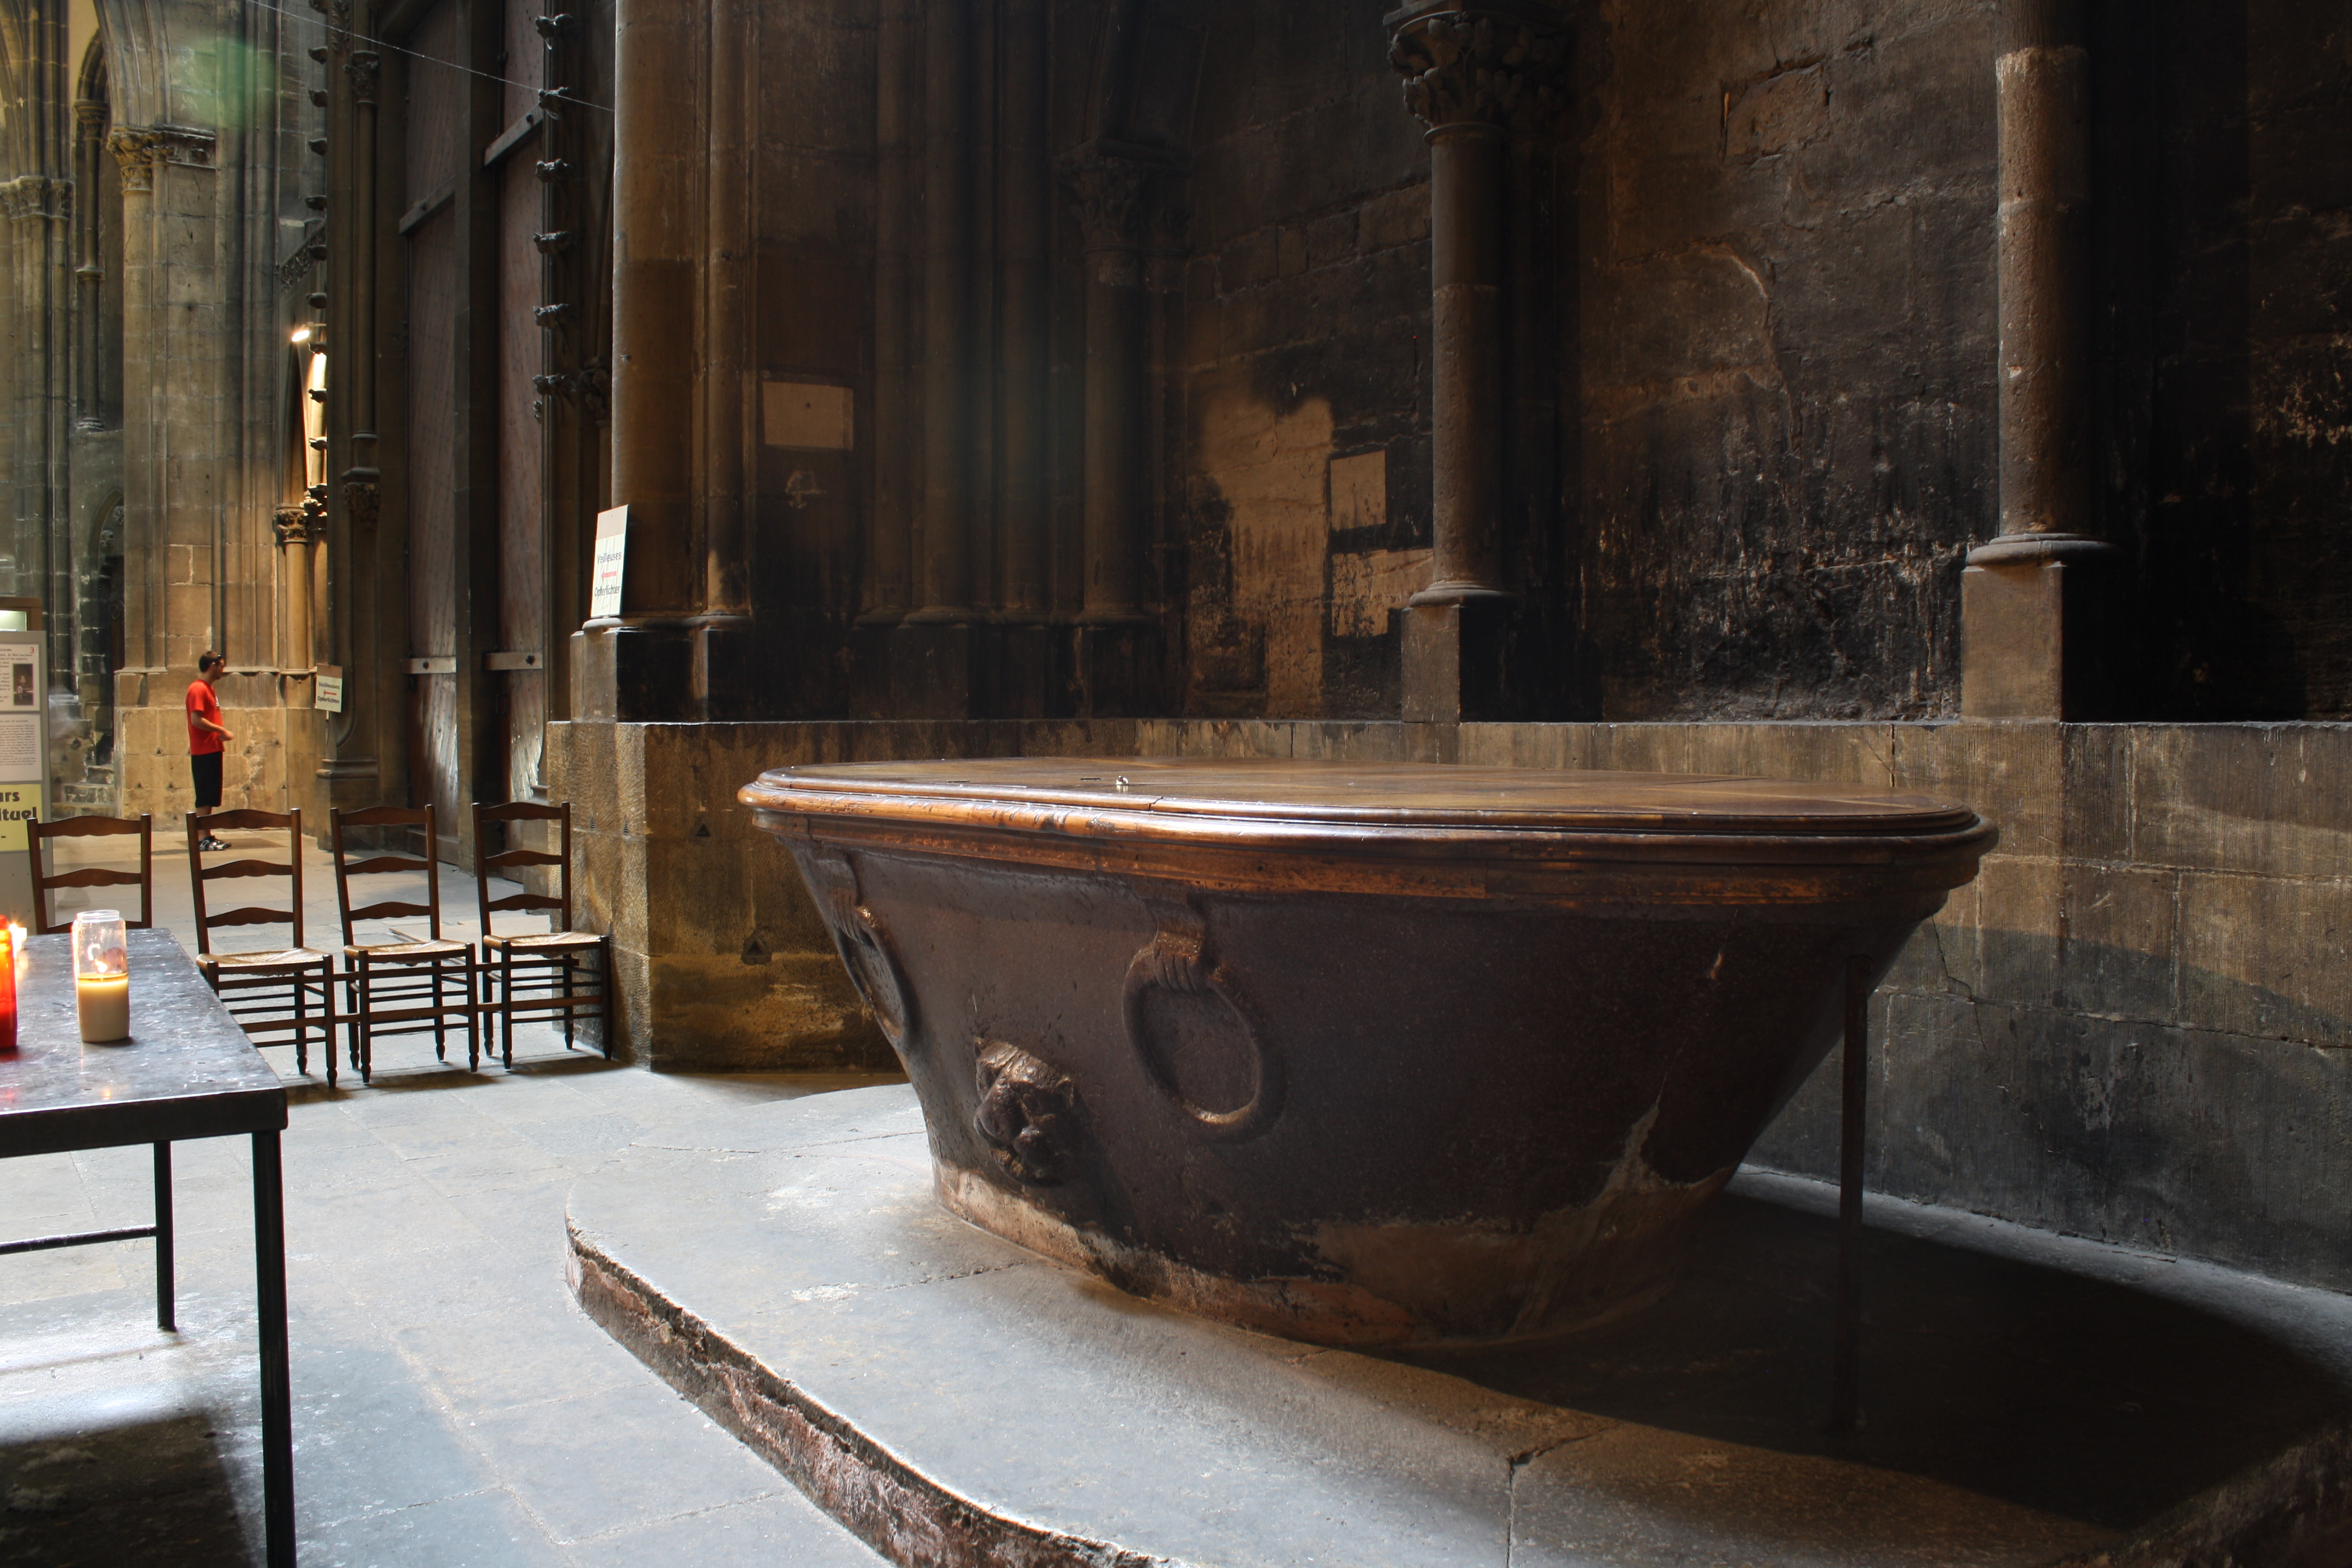 file fonts baptismaux cath drale de wikimedia